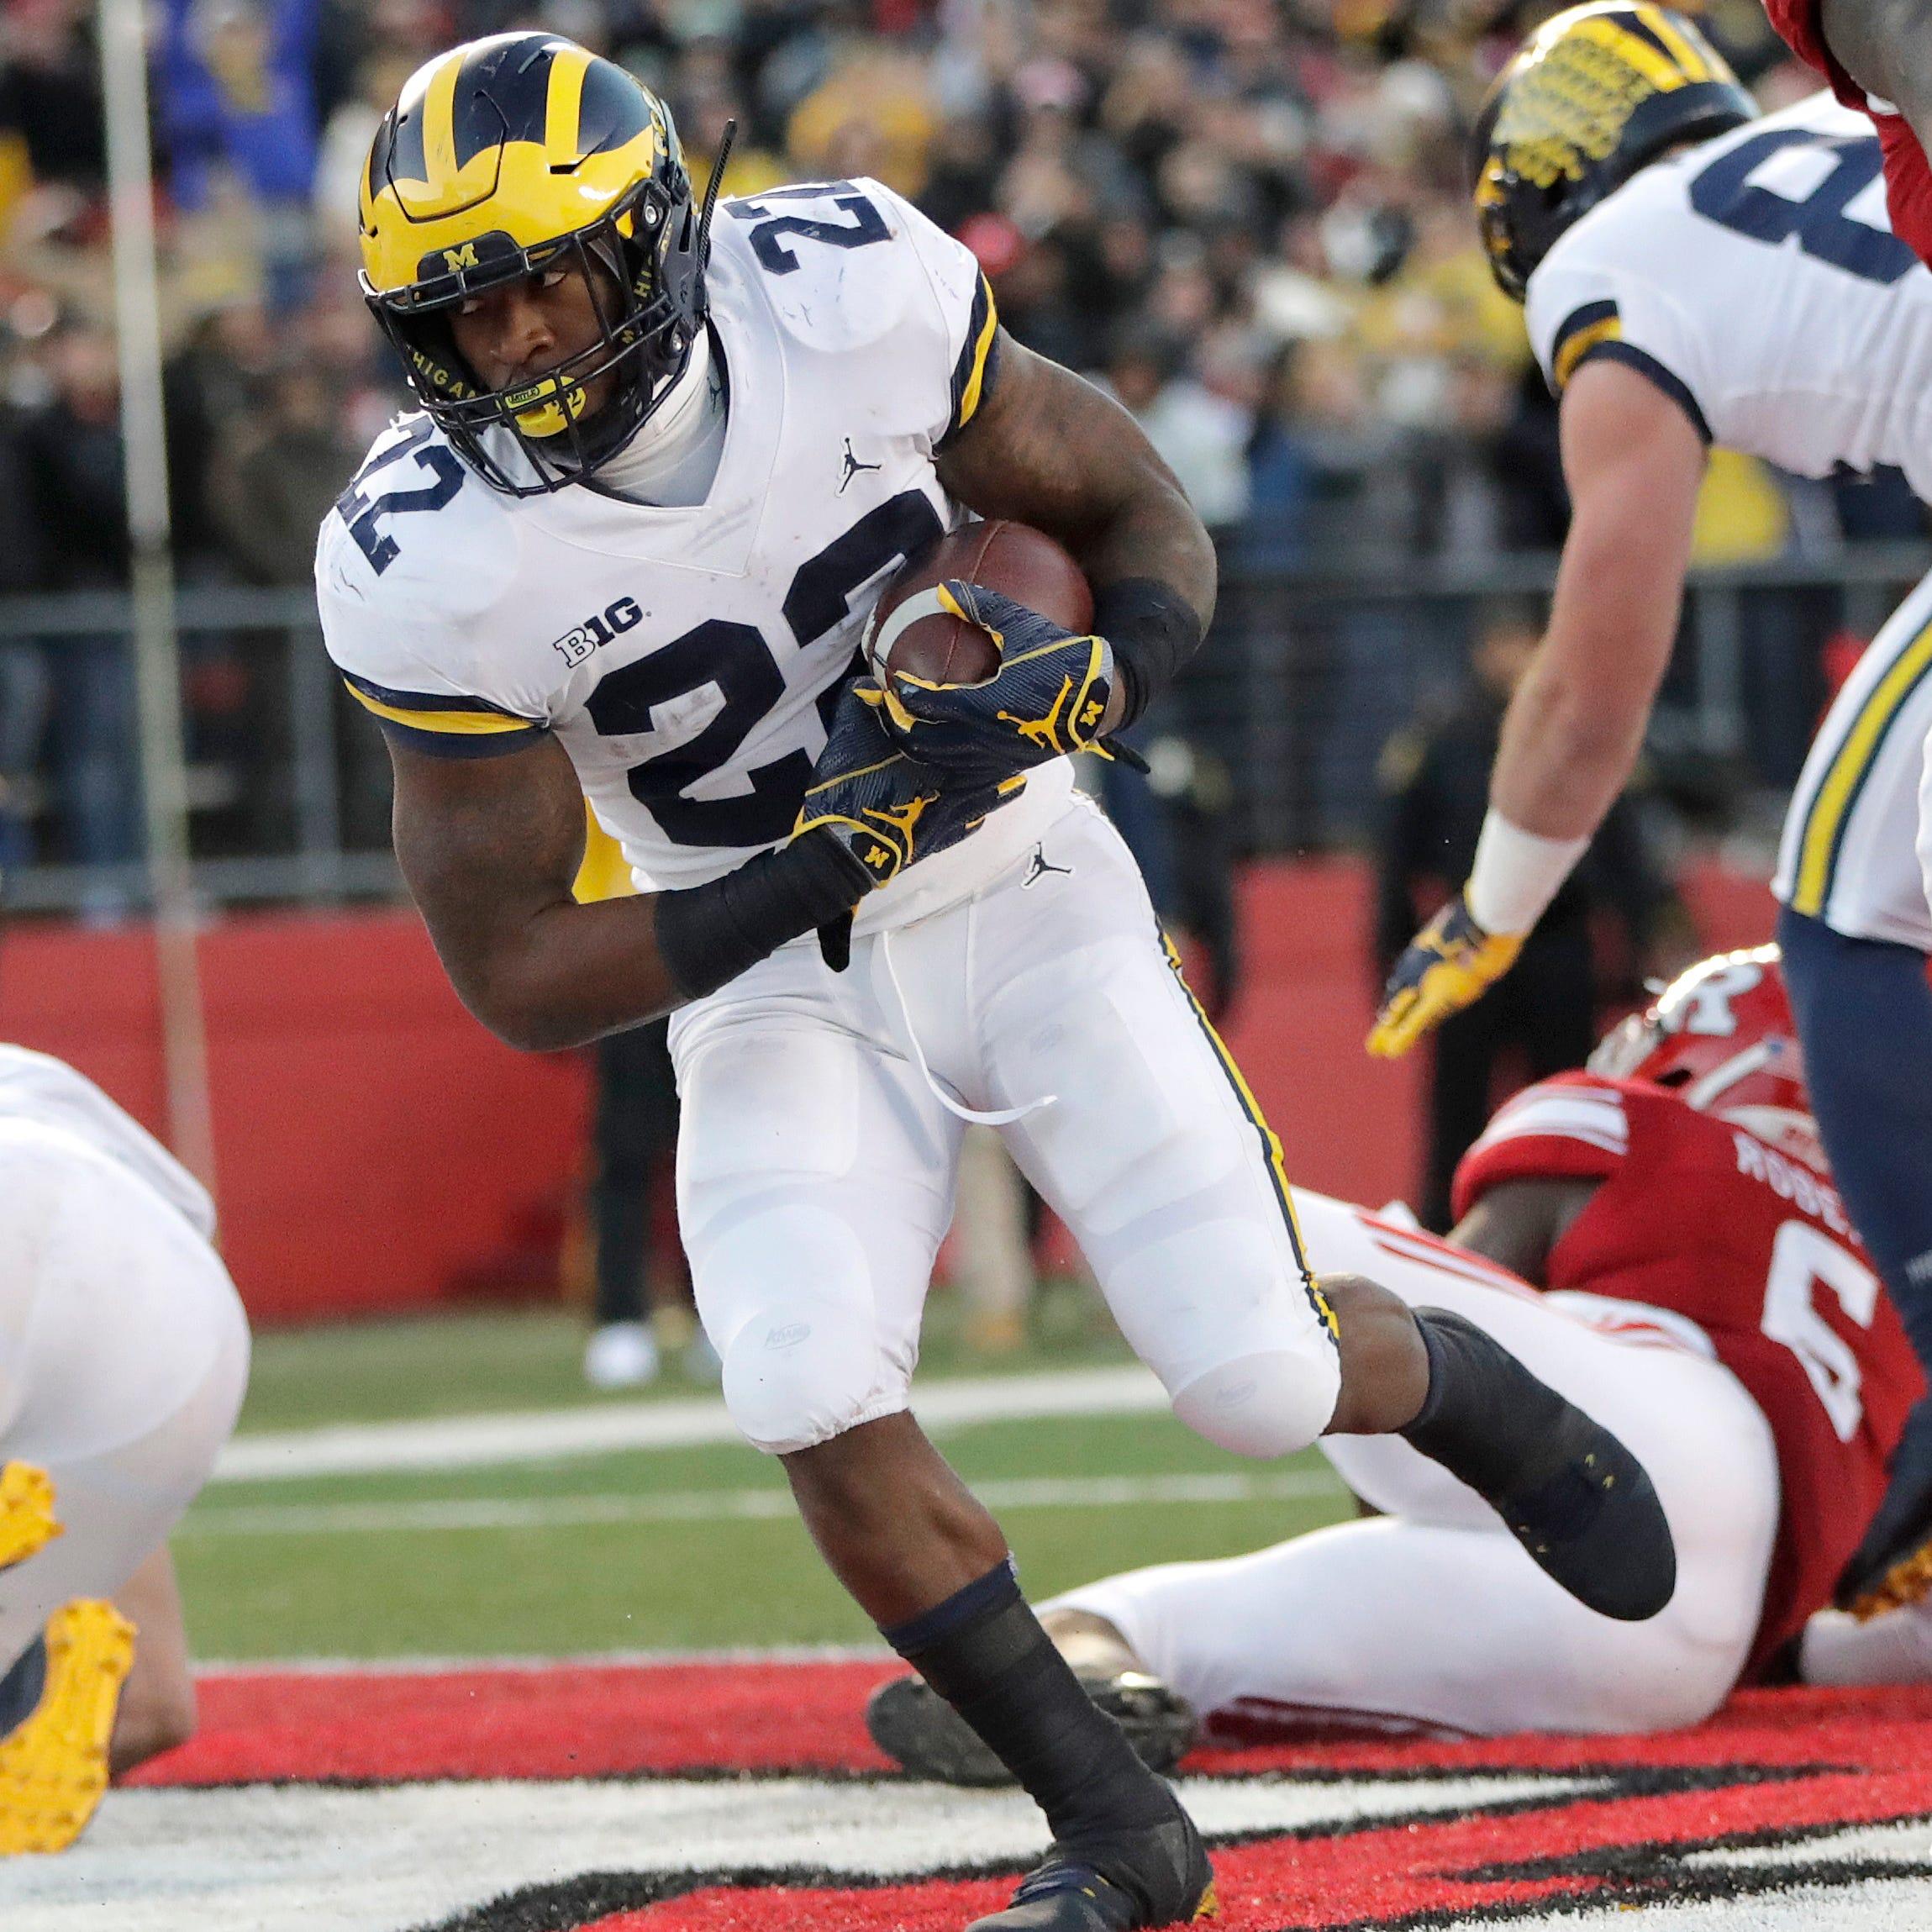 Michigan football's Karan Higdon guarantees win over Ohio State